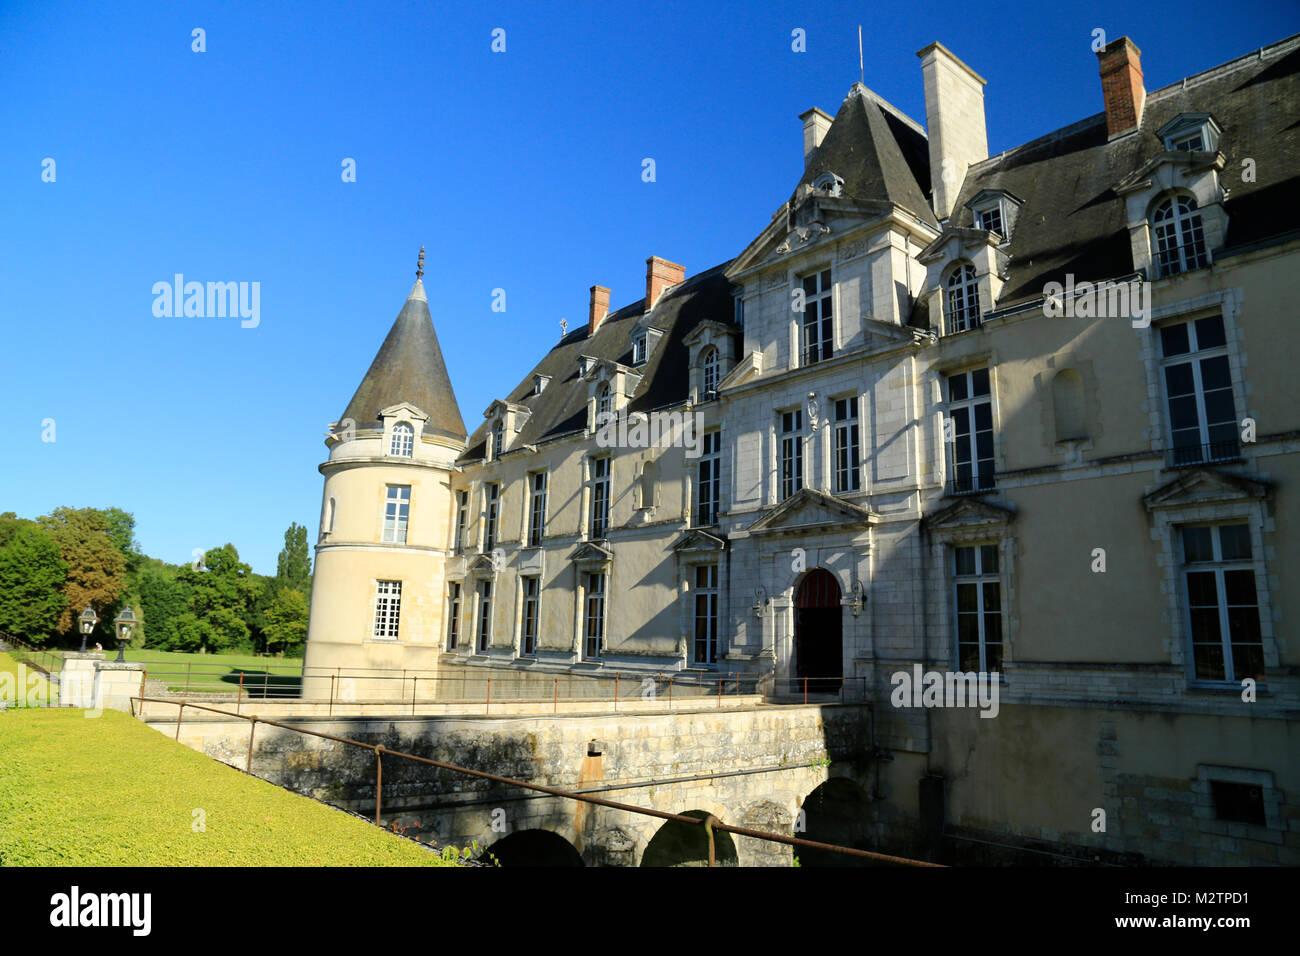 Chateau fontainebleau stock photos chateau fontainebleau for Hotel fontainebleau france